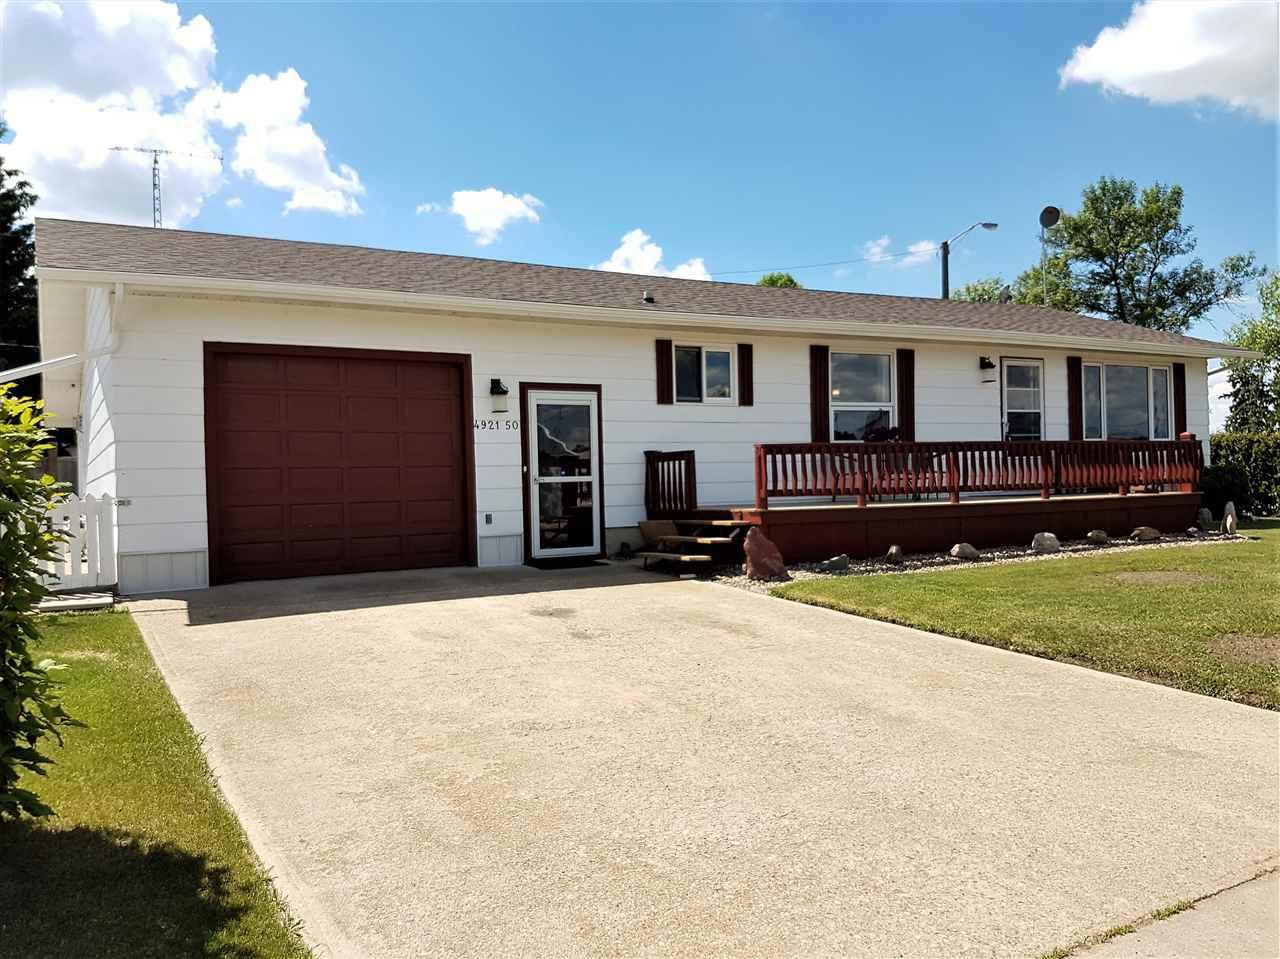 Main Photo: 4921 50 Street: Minburn House for sale : MLS®# E4116721